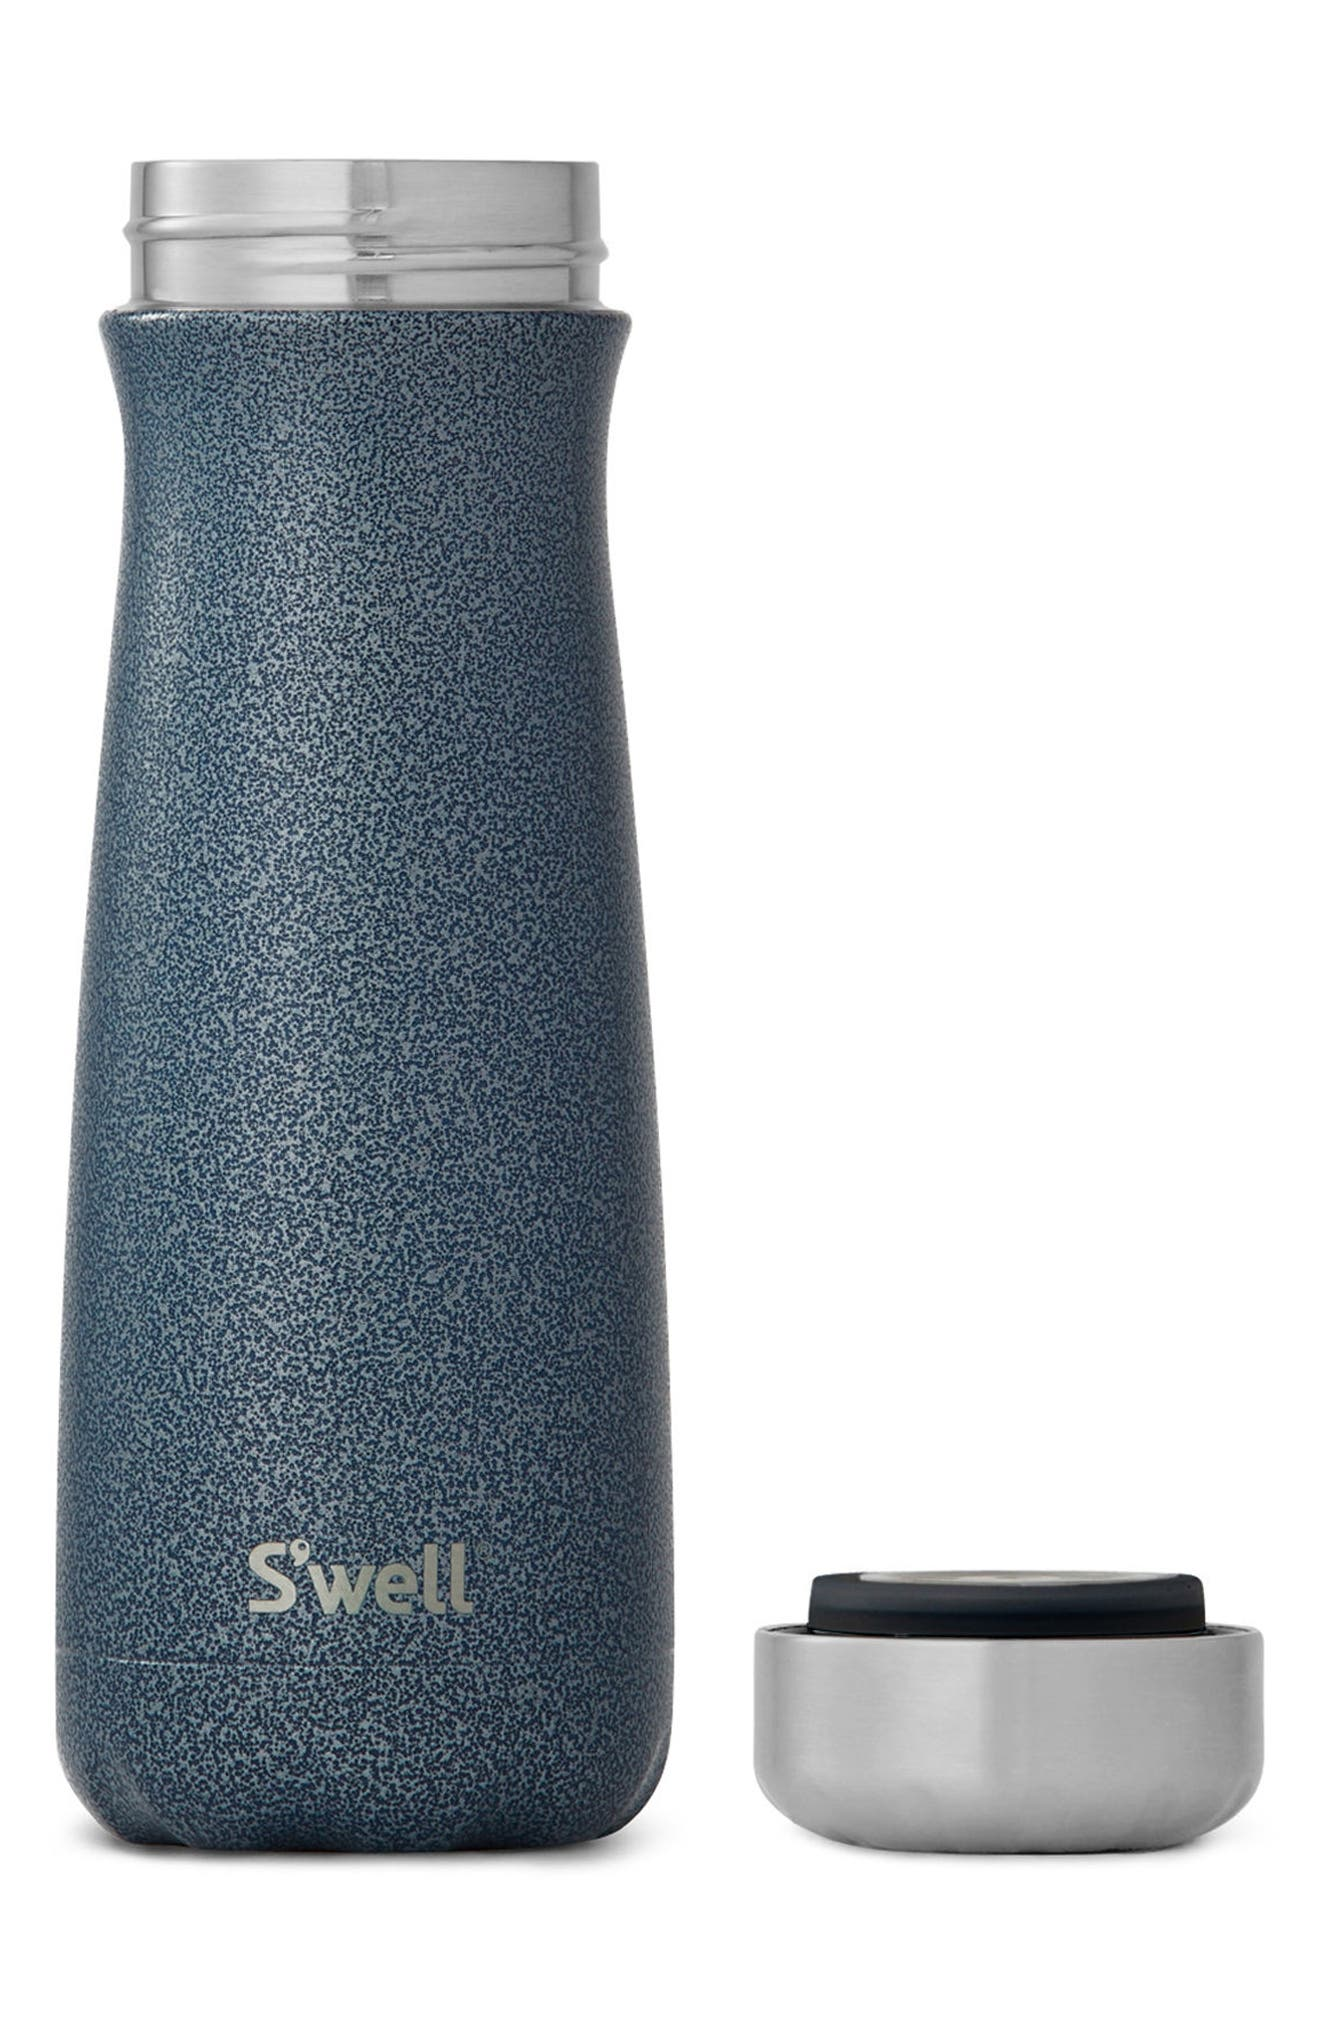 Traveler Night Sky Insulated Stainless Steel Water Bottle,                             Alternate thumbnail 2, color,                             NIGHT SKY